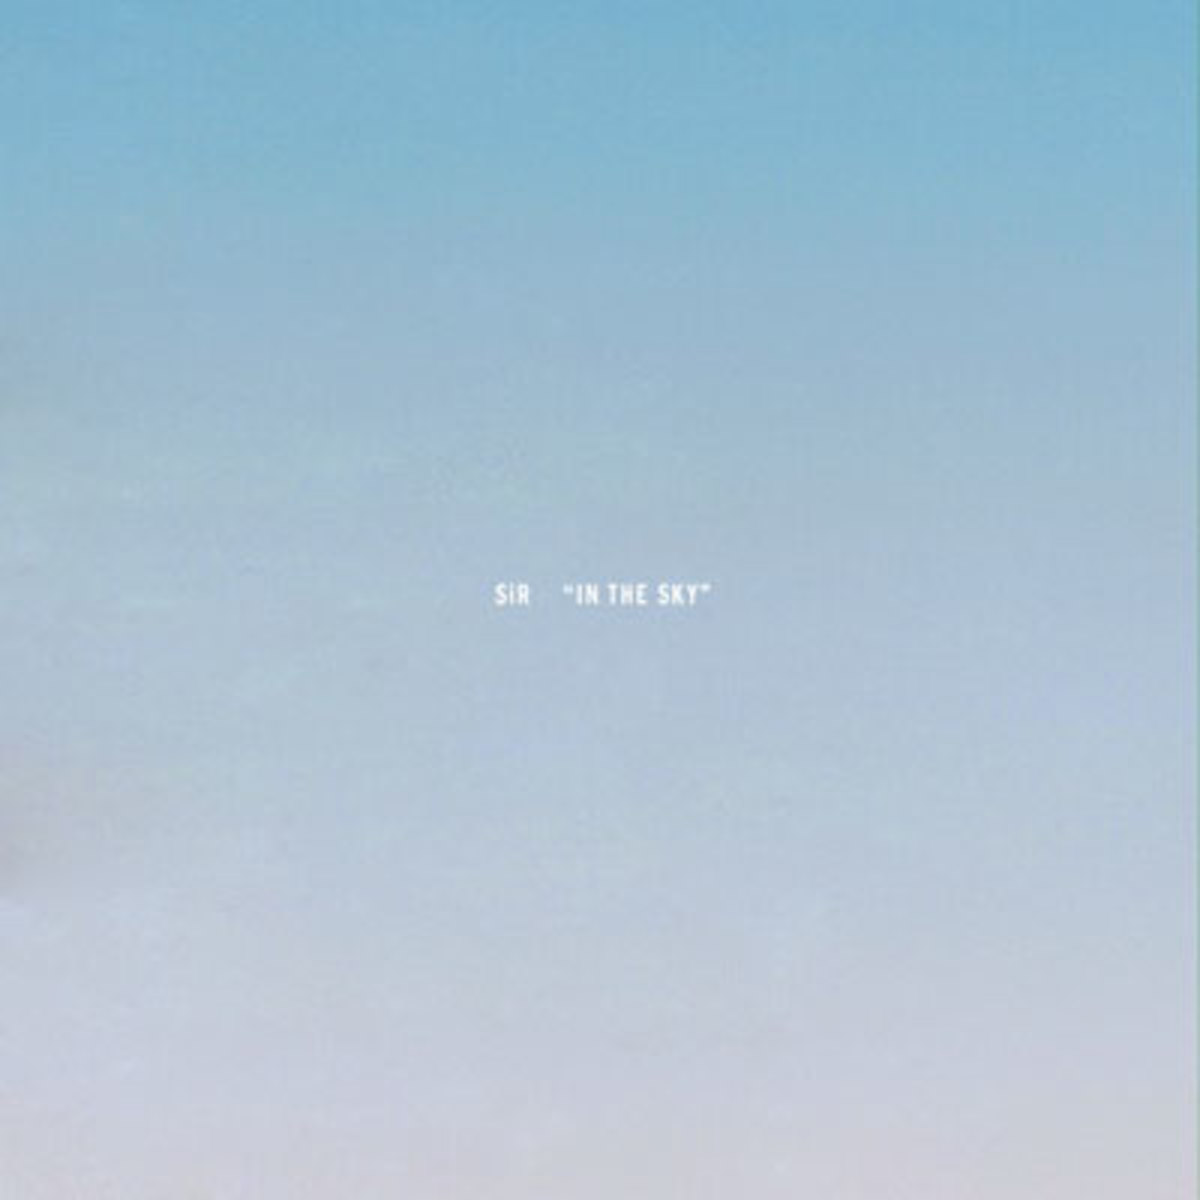 sir-in-the-sky.jpg